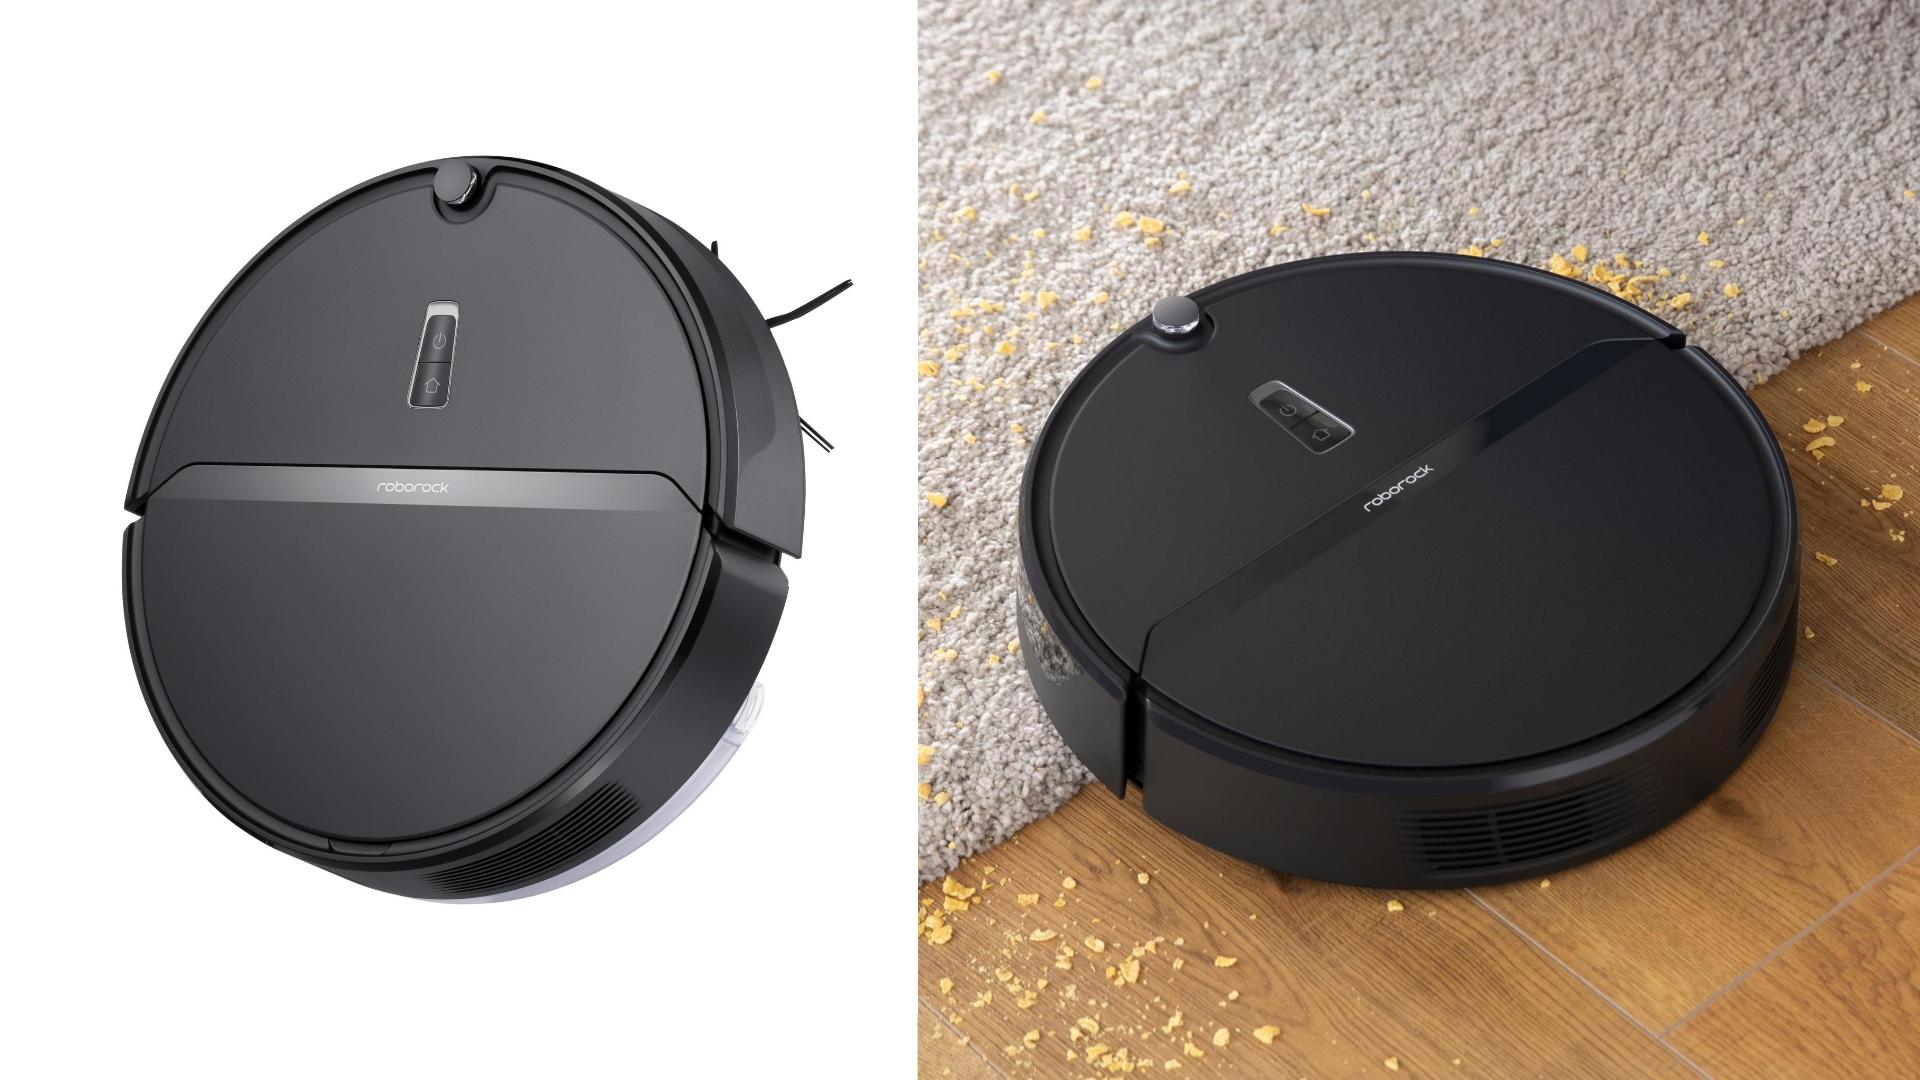 Roborock E4 robot vacuum